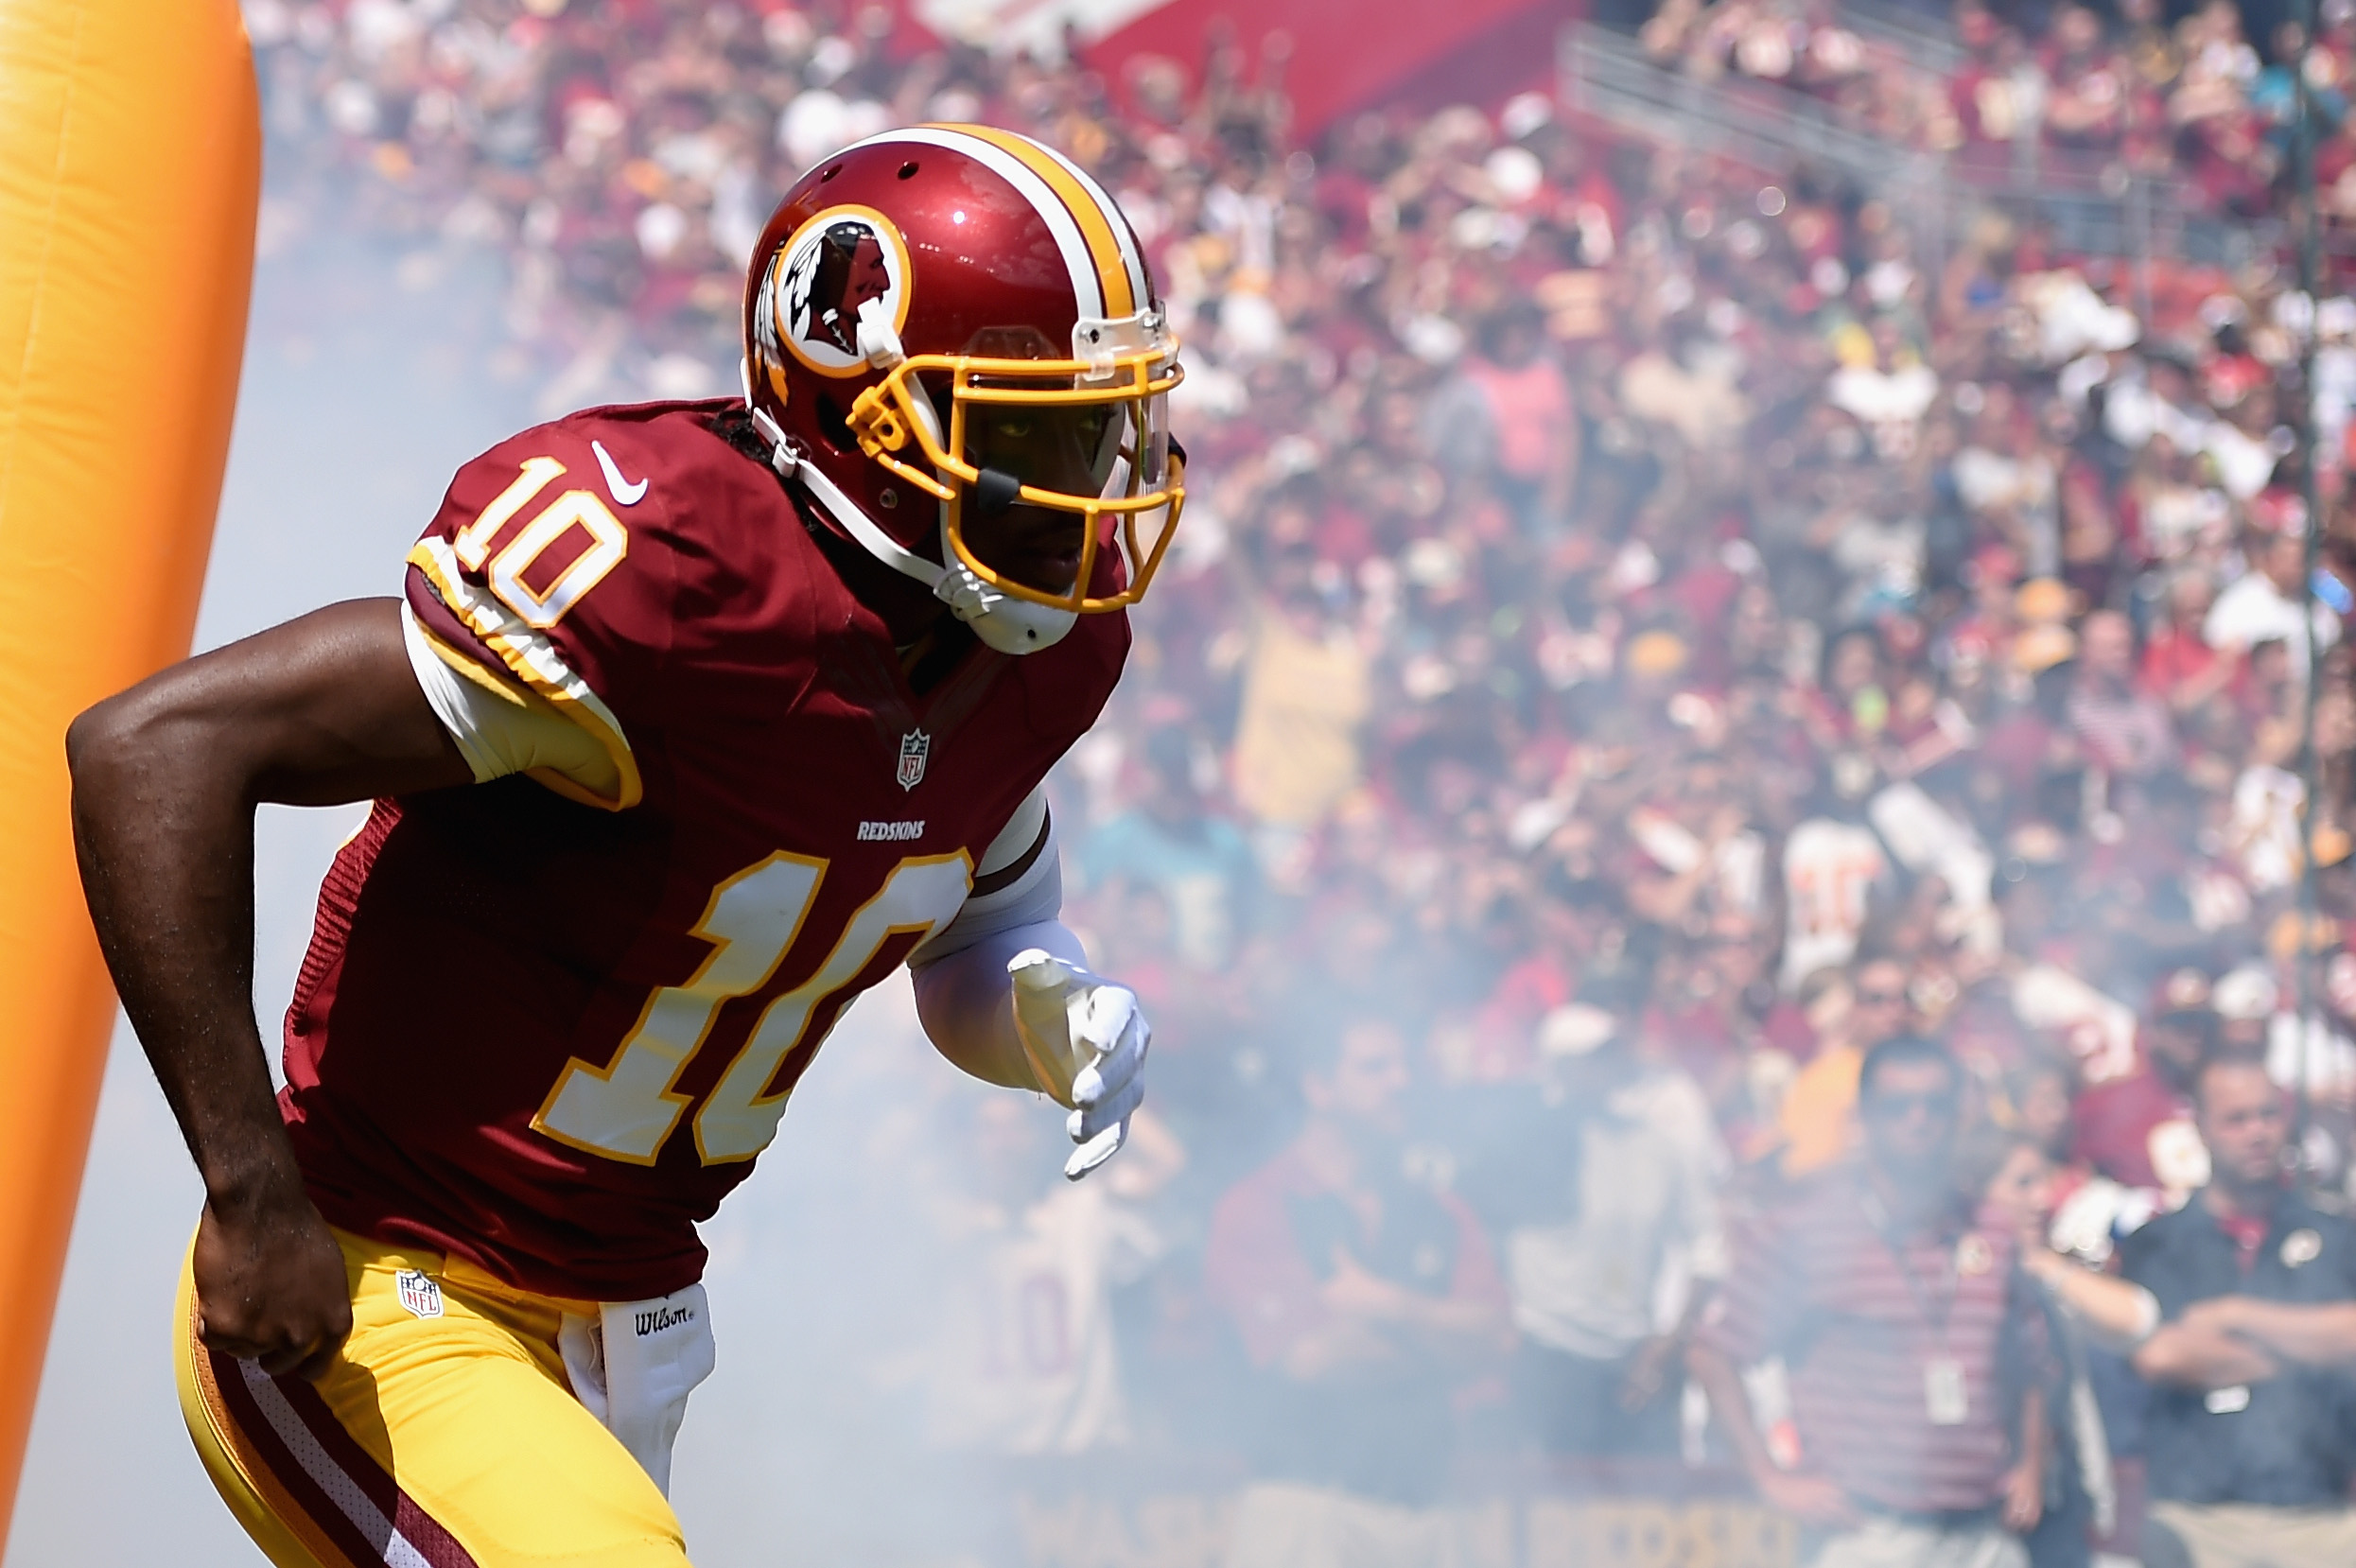 Robert Griffin III, Washington Redskins